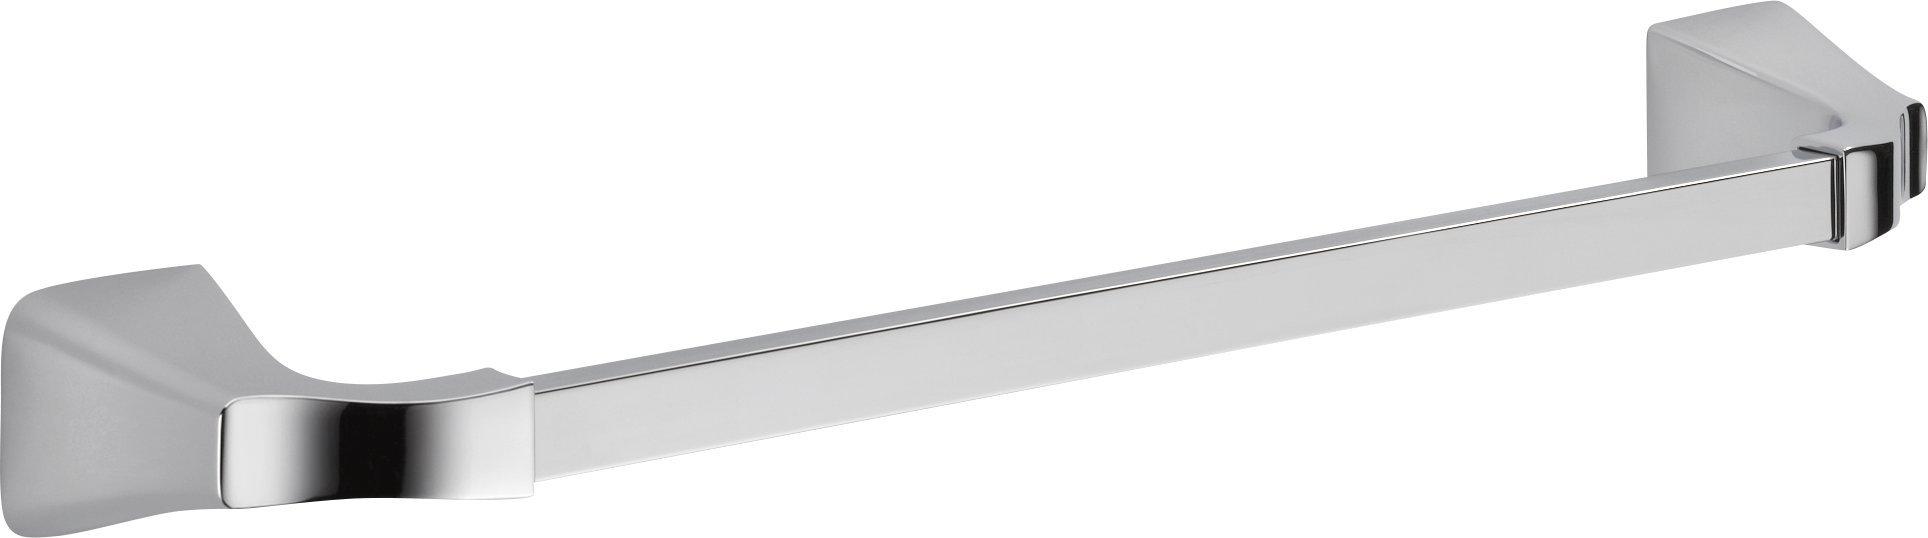 Delta Faucet 75218 Tesla Towel Bar, Chrome, 18''